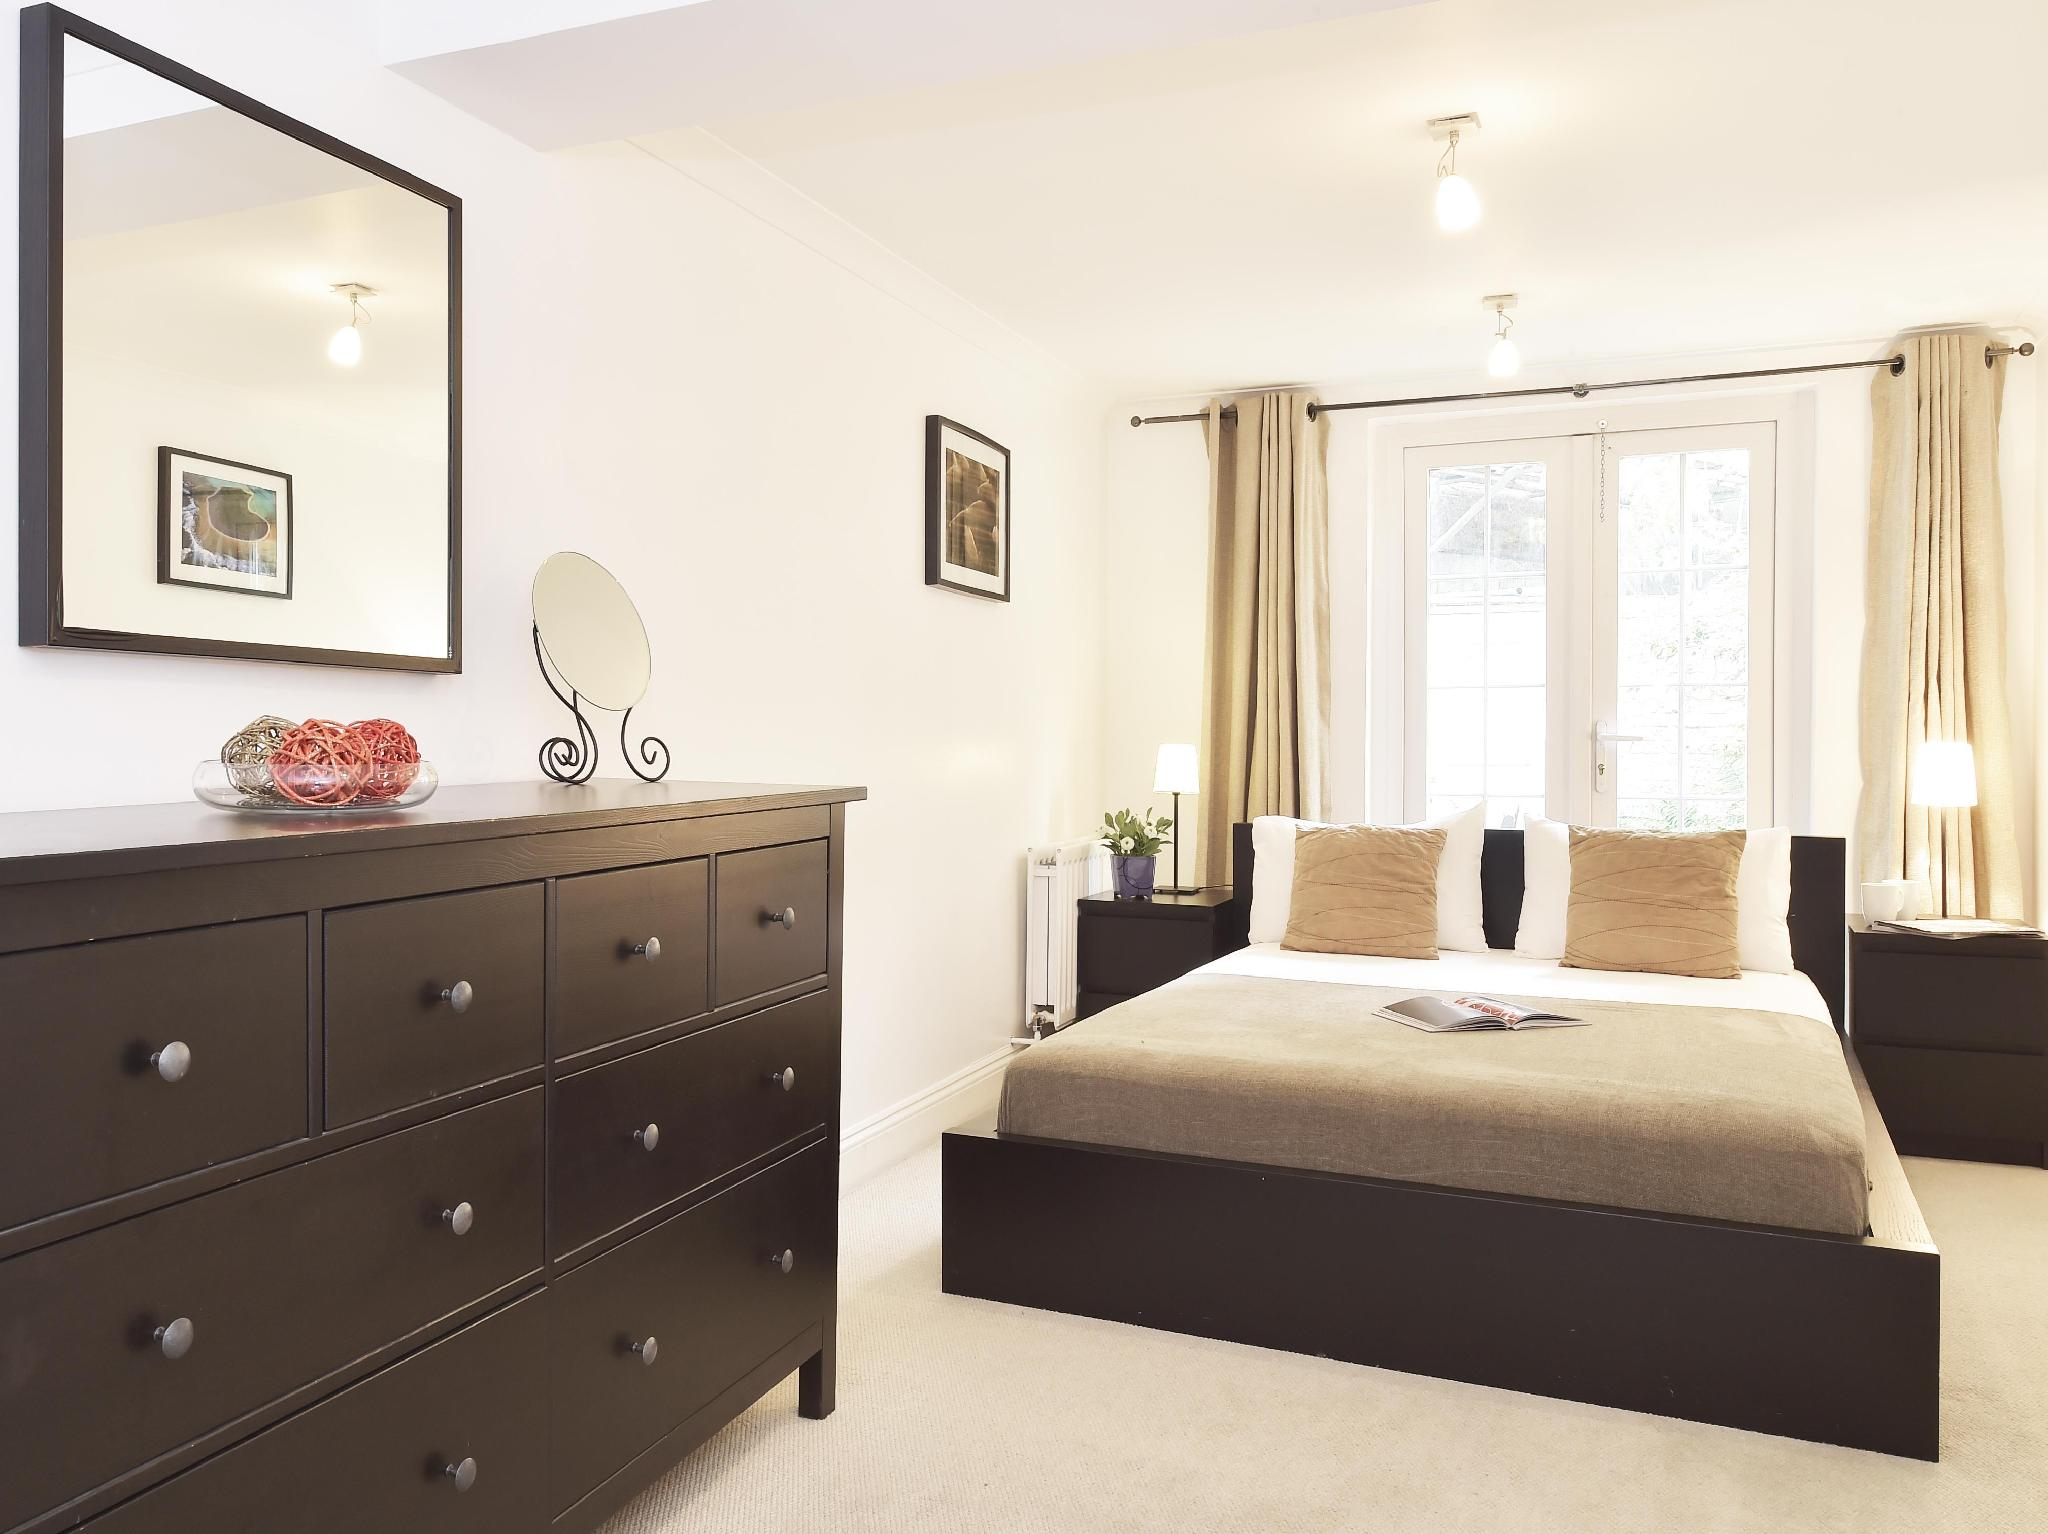 camden nike apartments london from 177 save on agoda rh agoda com